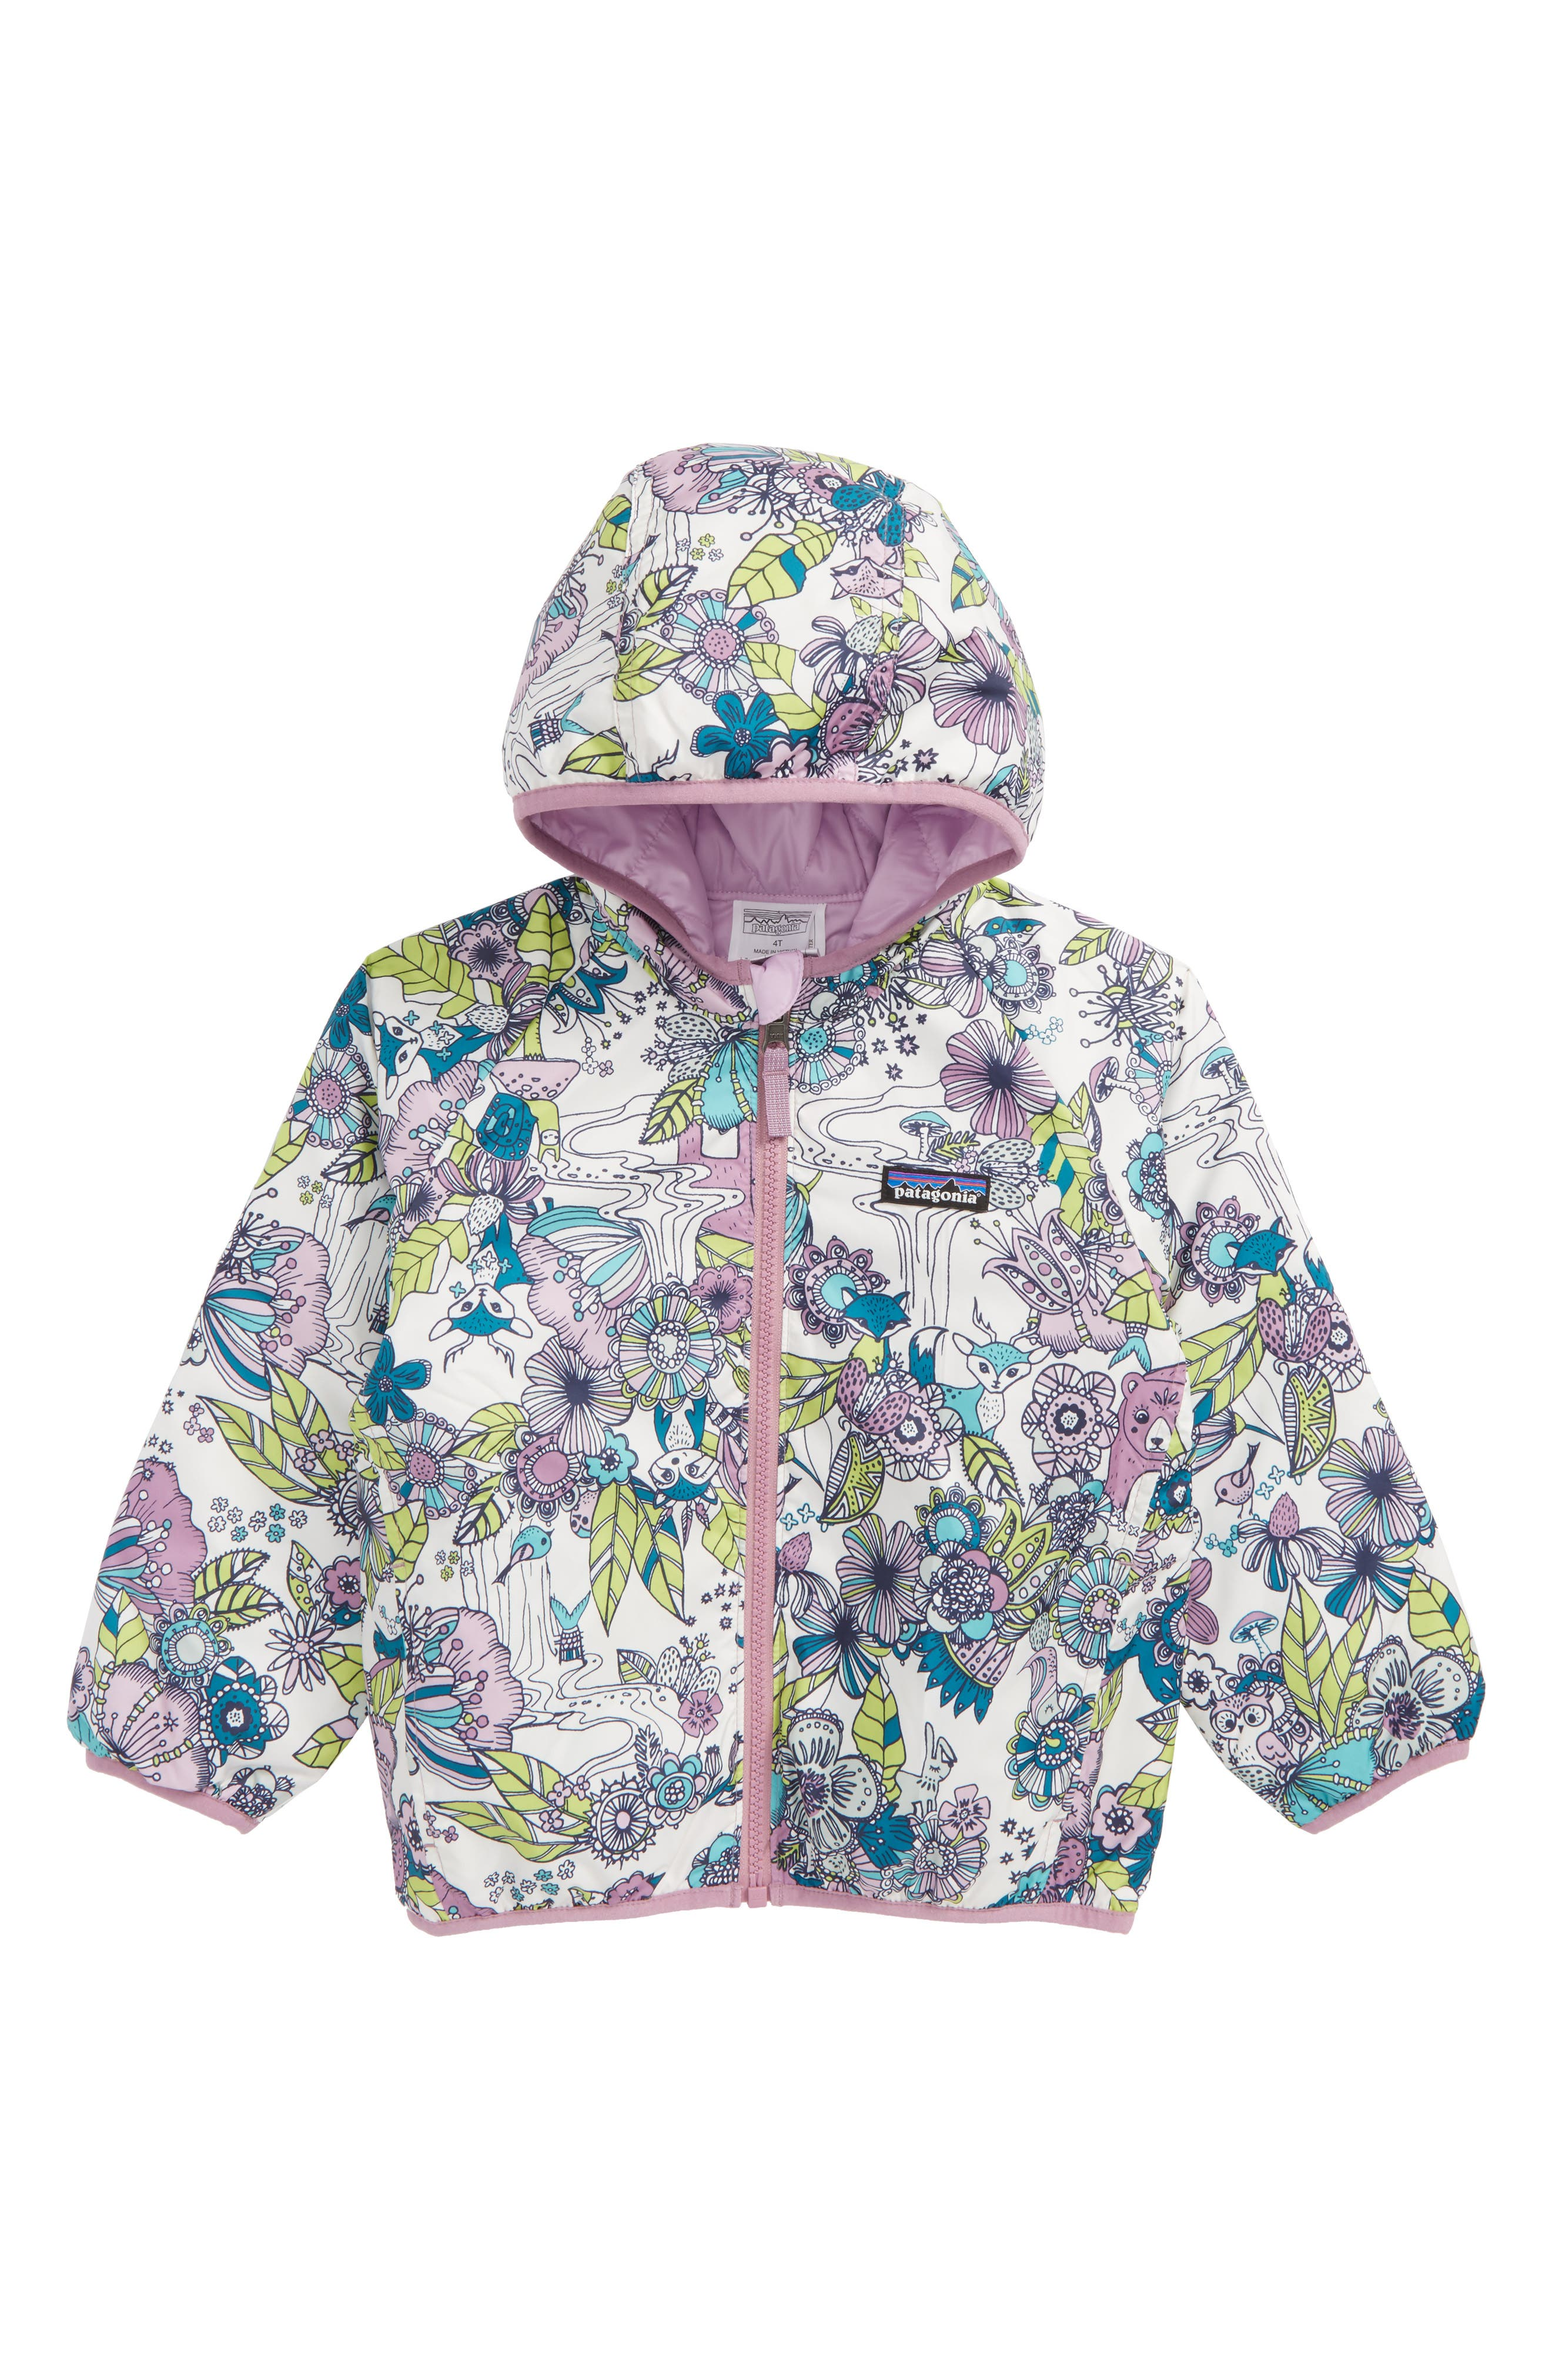 Patagonia 'Puff-Ball' Water Resistant Reversible Hooded Jacket (Toddler Girls)